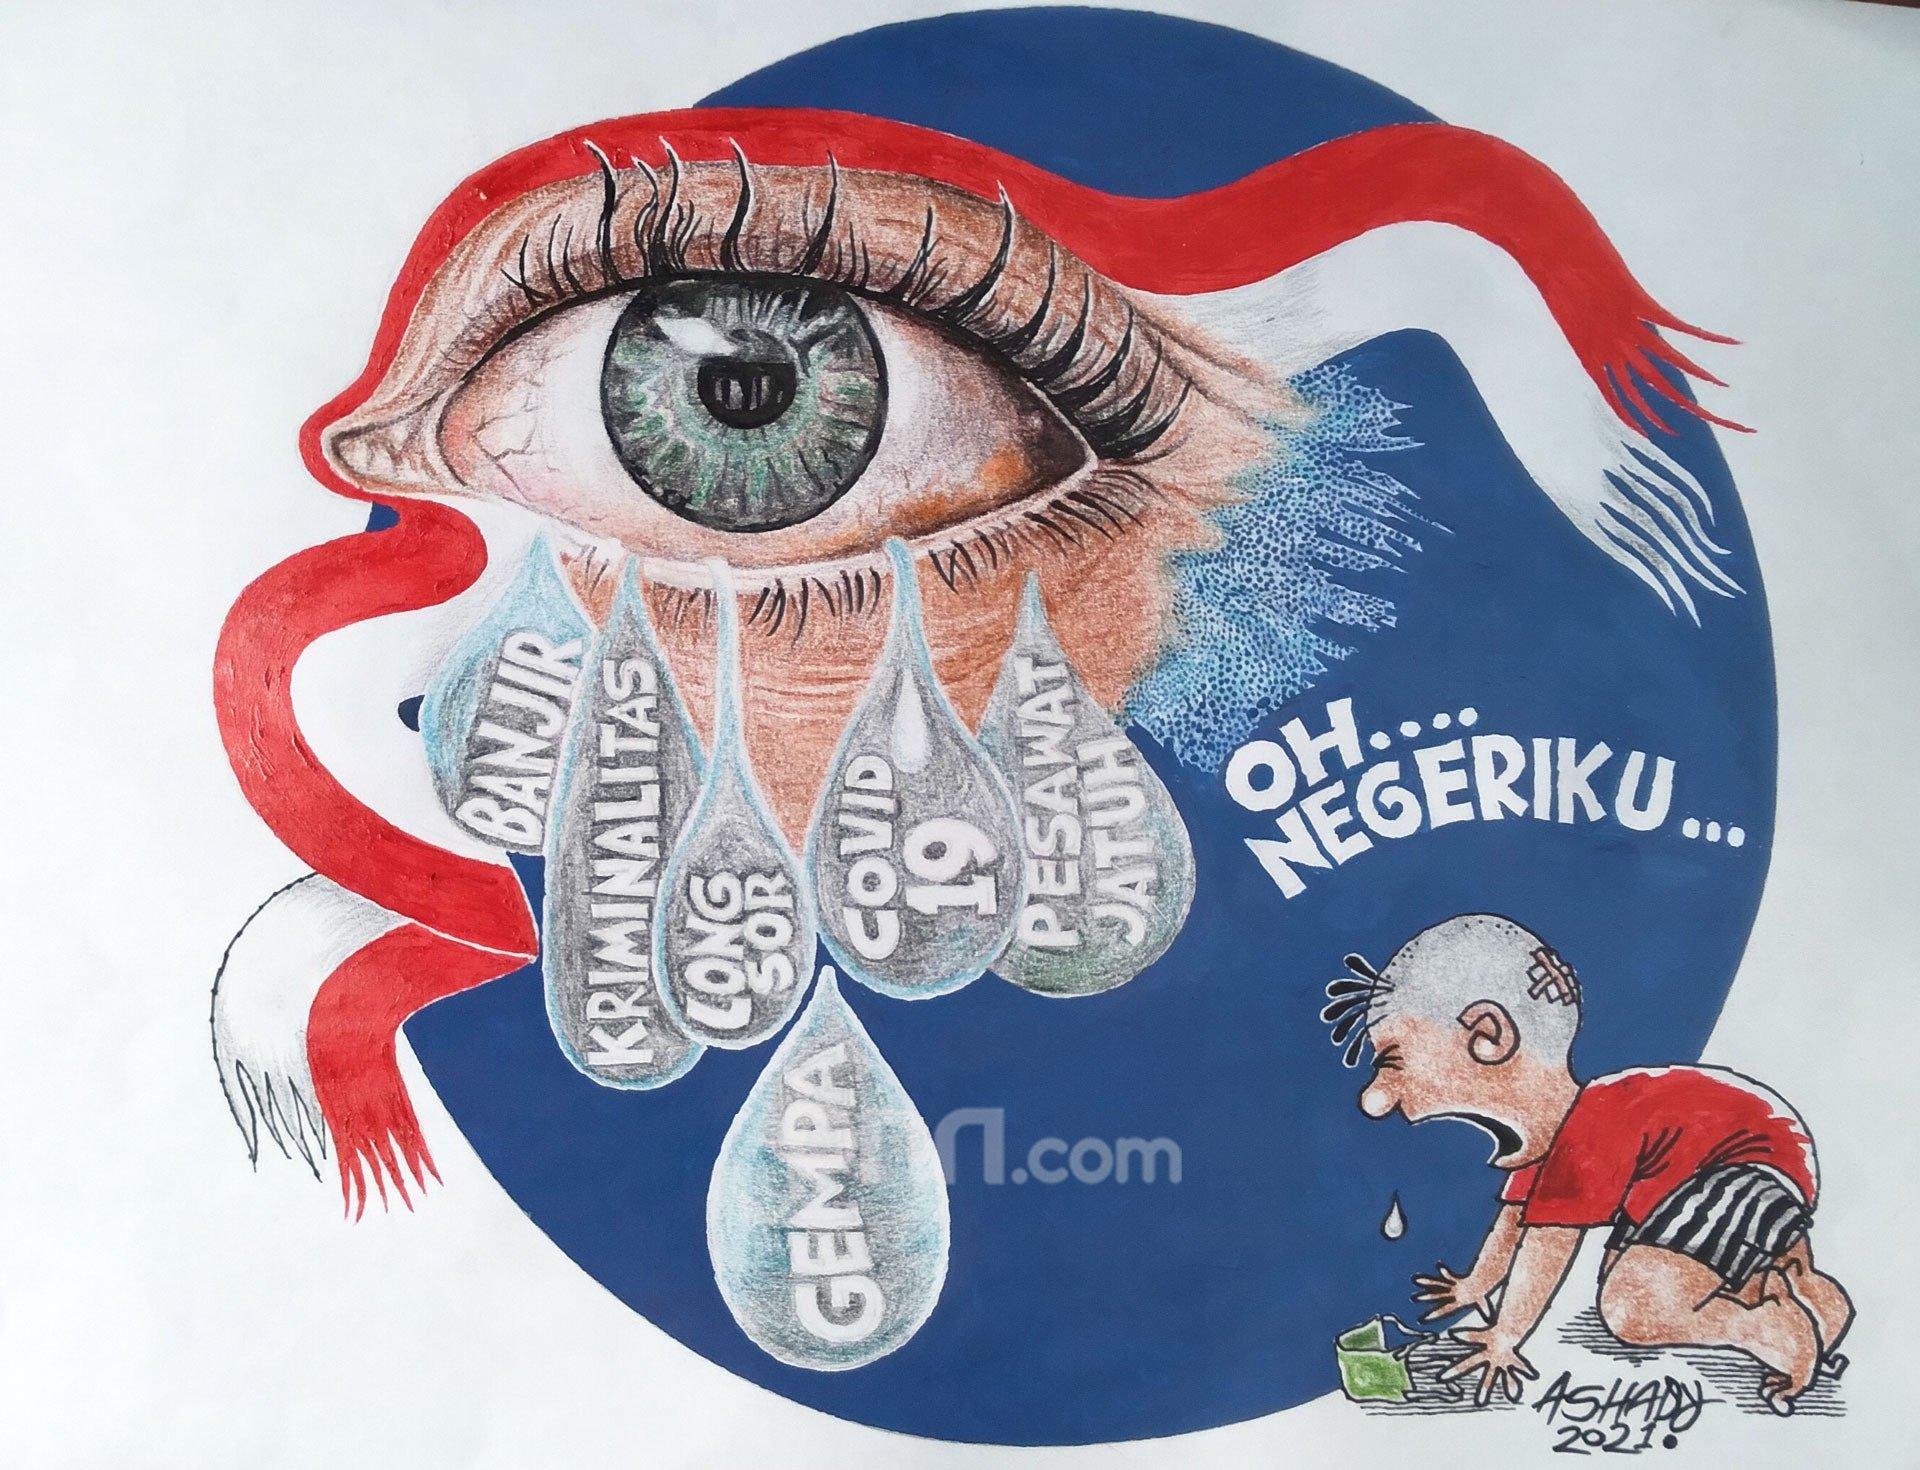 Oh Negeriku. Karikatur oleh Ashady - JPNN.com